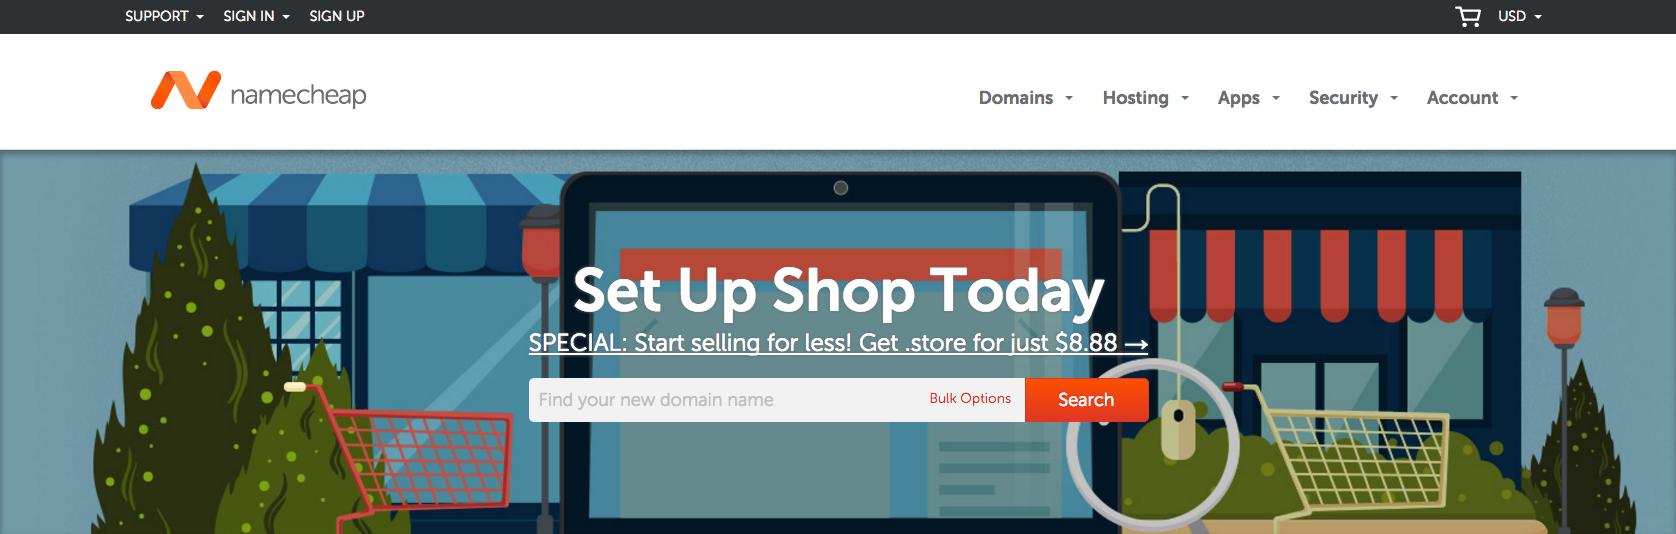 Namecheap Shared Hosting Review Sun Web Hosting